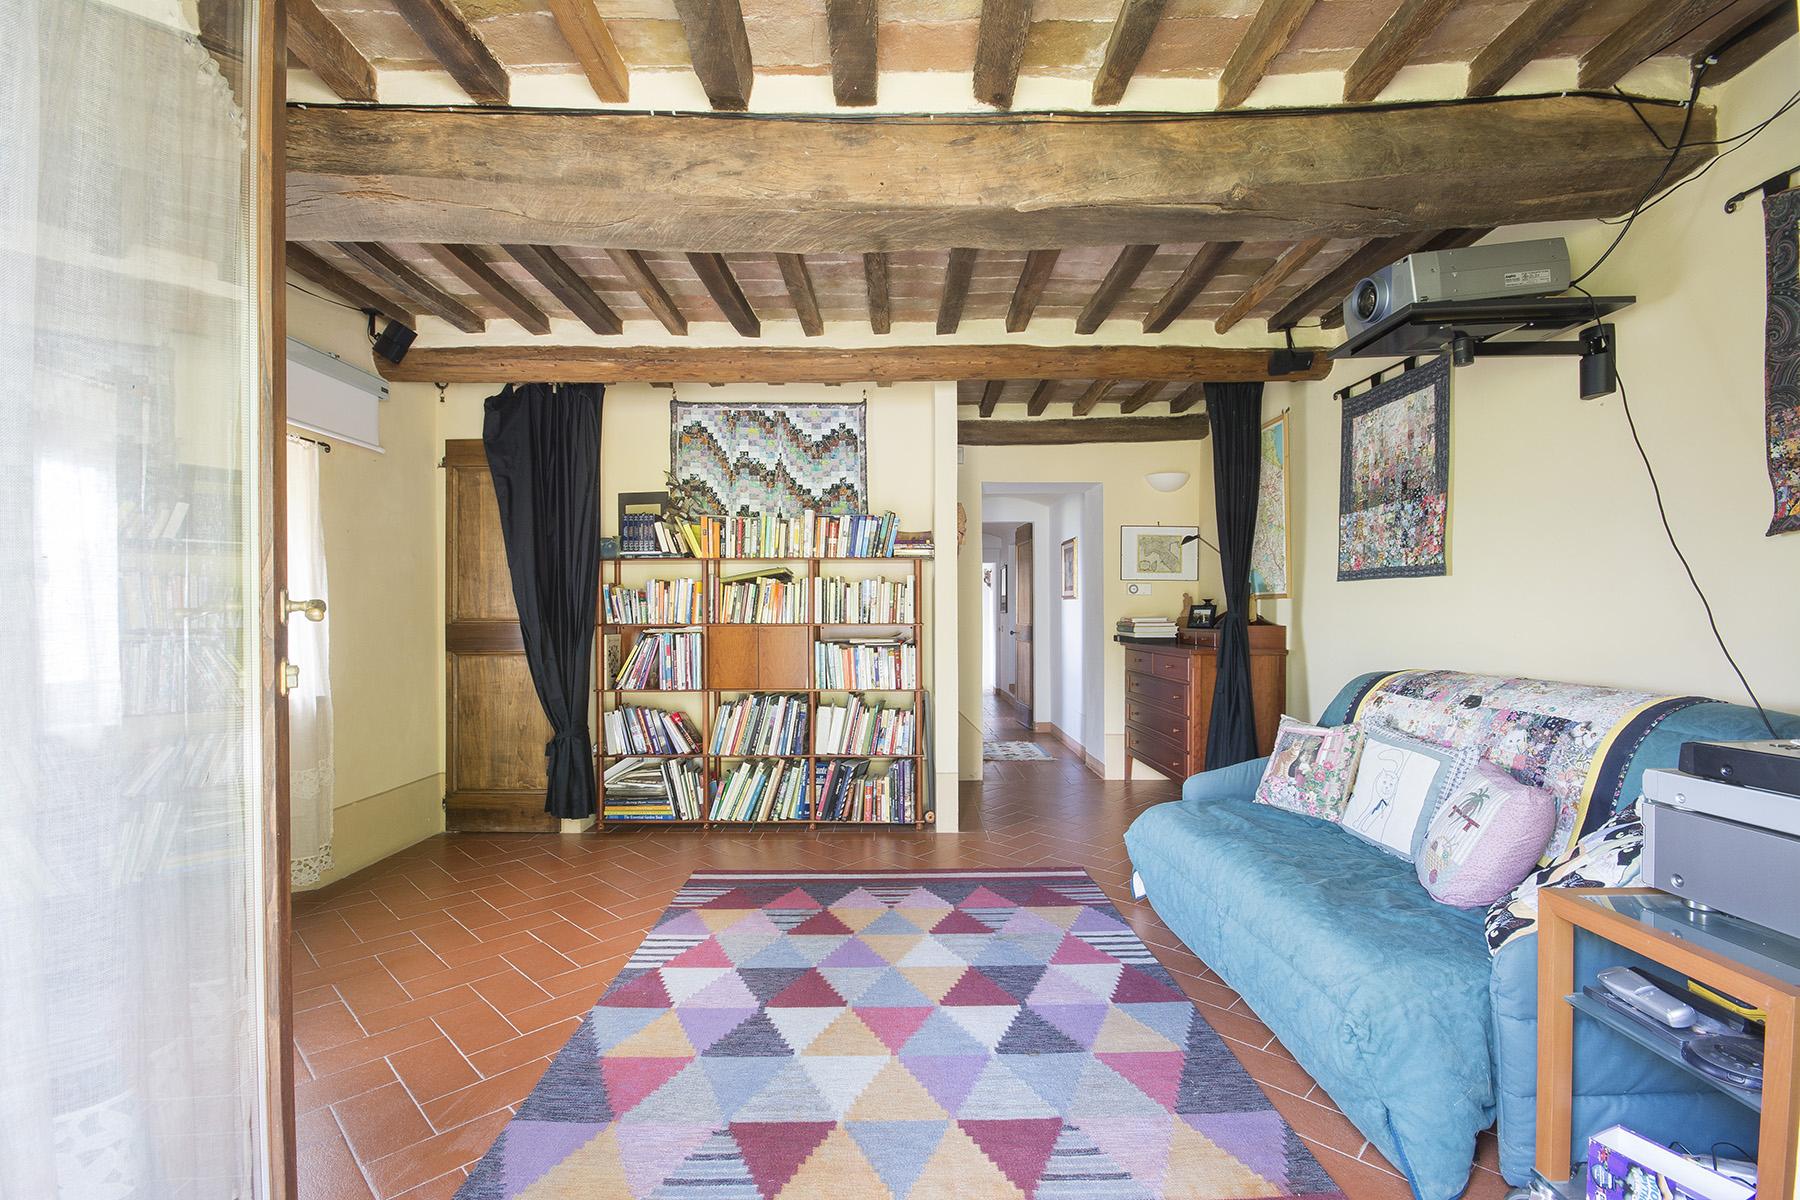 Casa indipendente in Vendita a Pienza: 5 locali, 400 mq - Foto 21